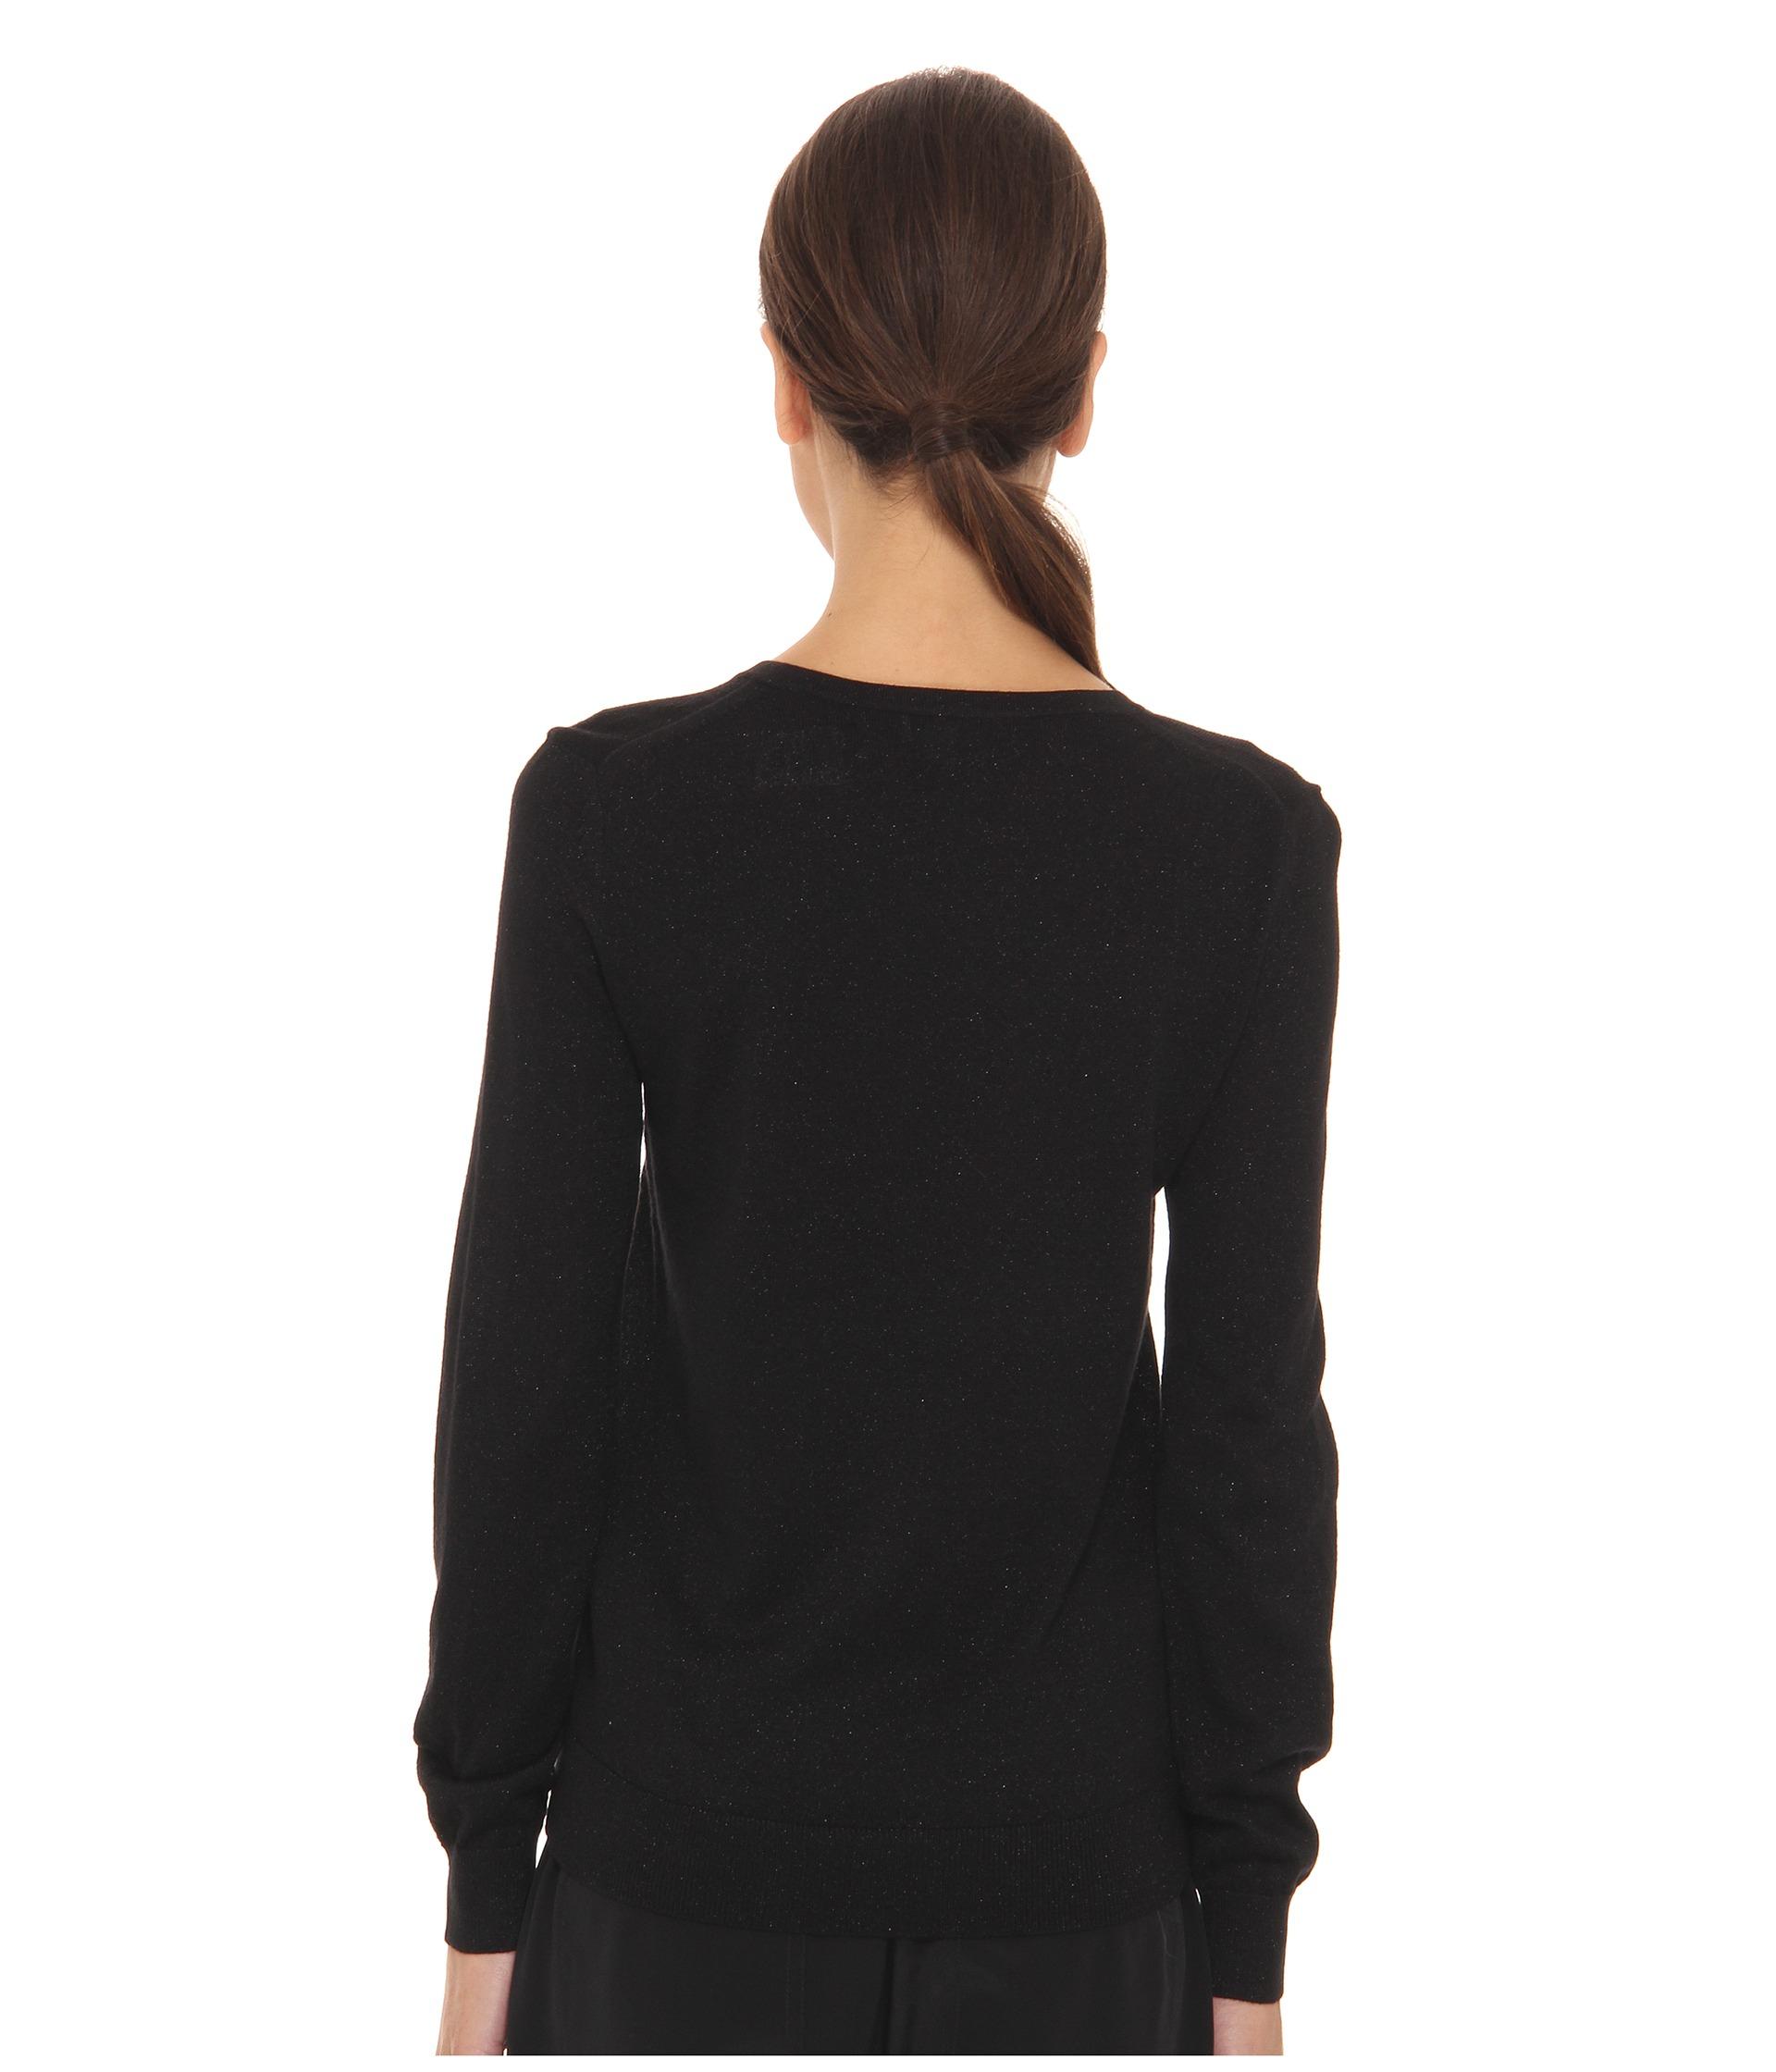 marc by marc jacobs betty birdie sweater in black black multi lyst. Black Bedroom Furniture Sets. Home Design Ideas